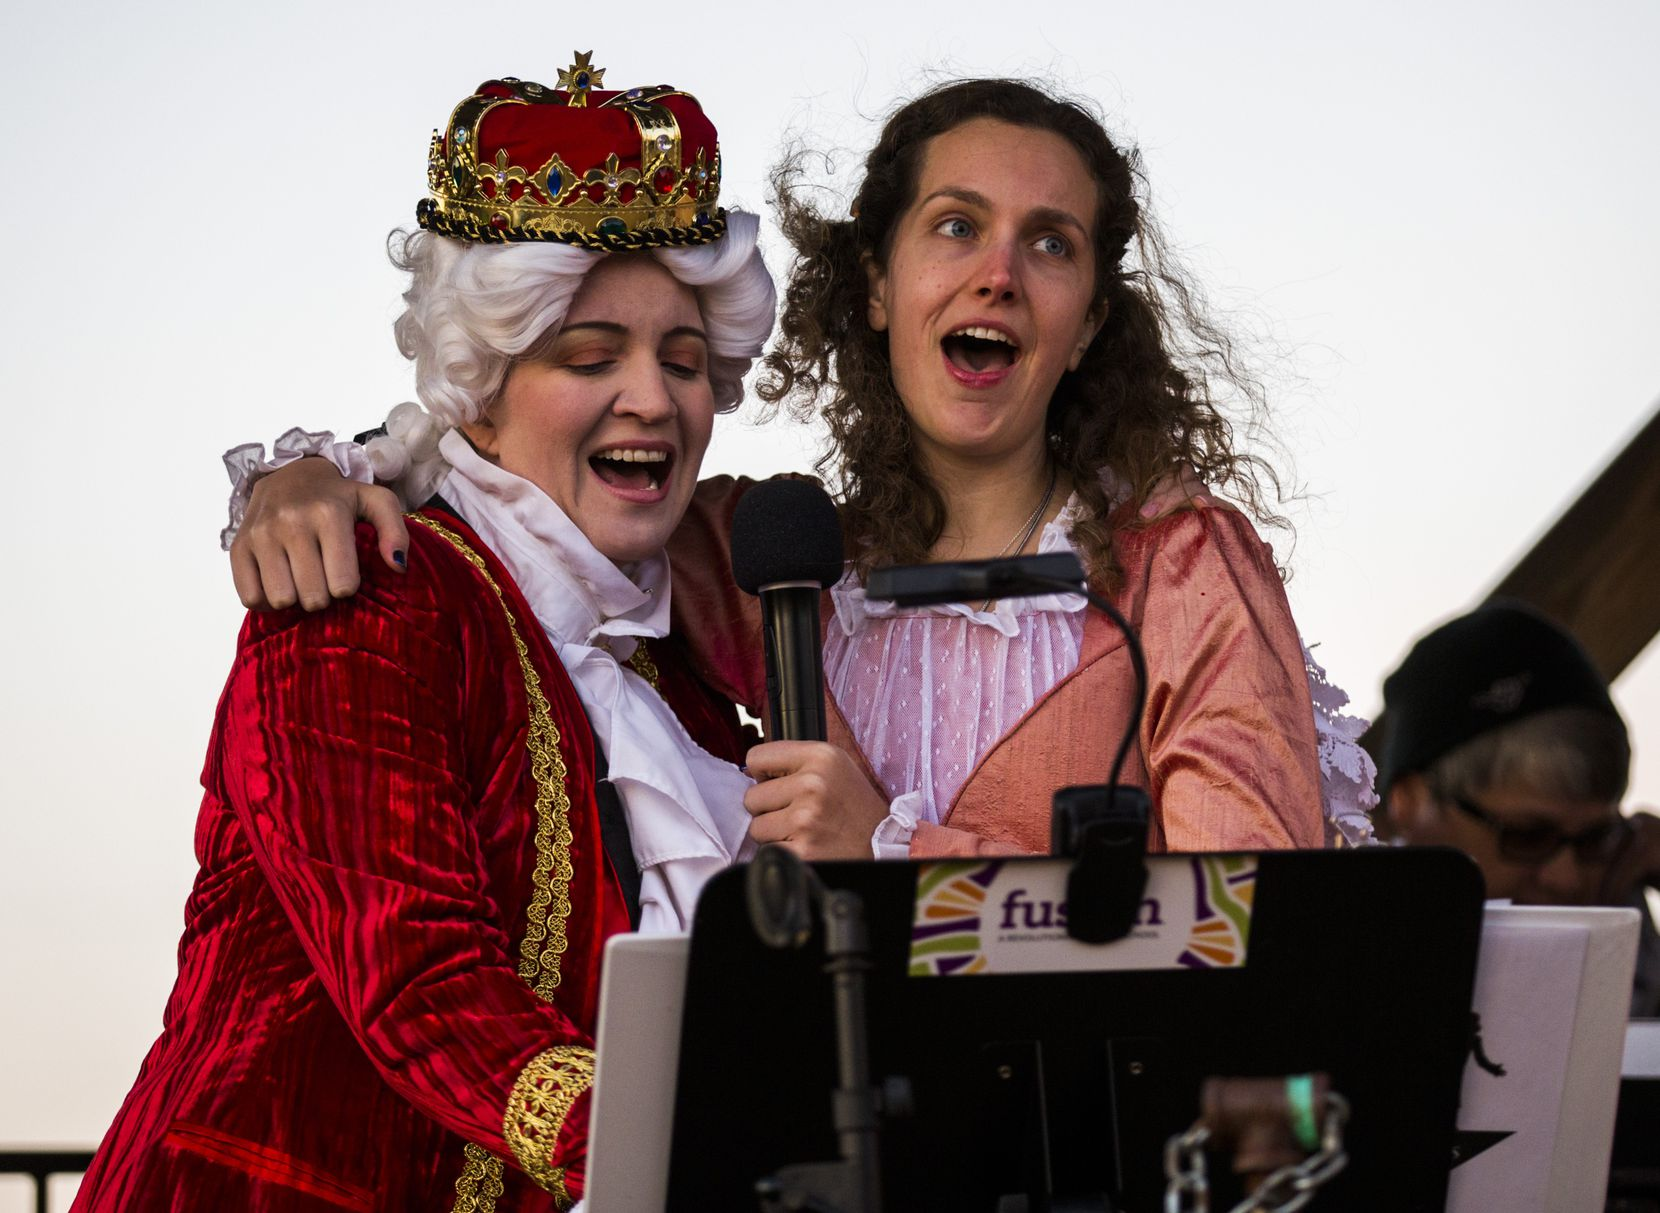 Suzanne Solomon (left) and Priscilla Spencer got into the act at a 2019 Hamiltunes event.